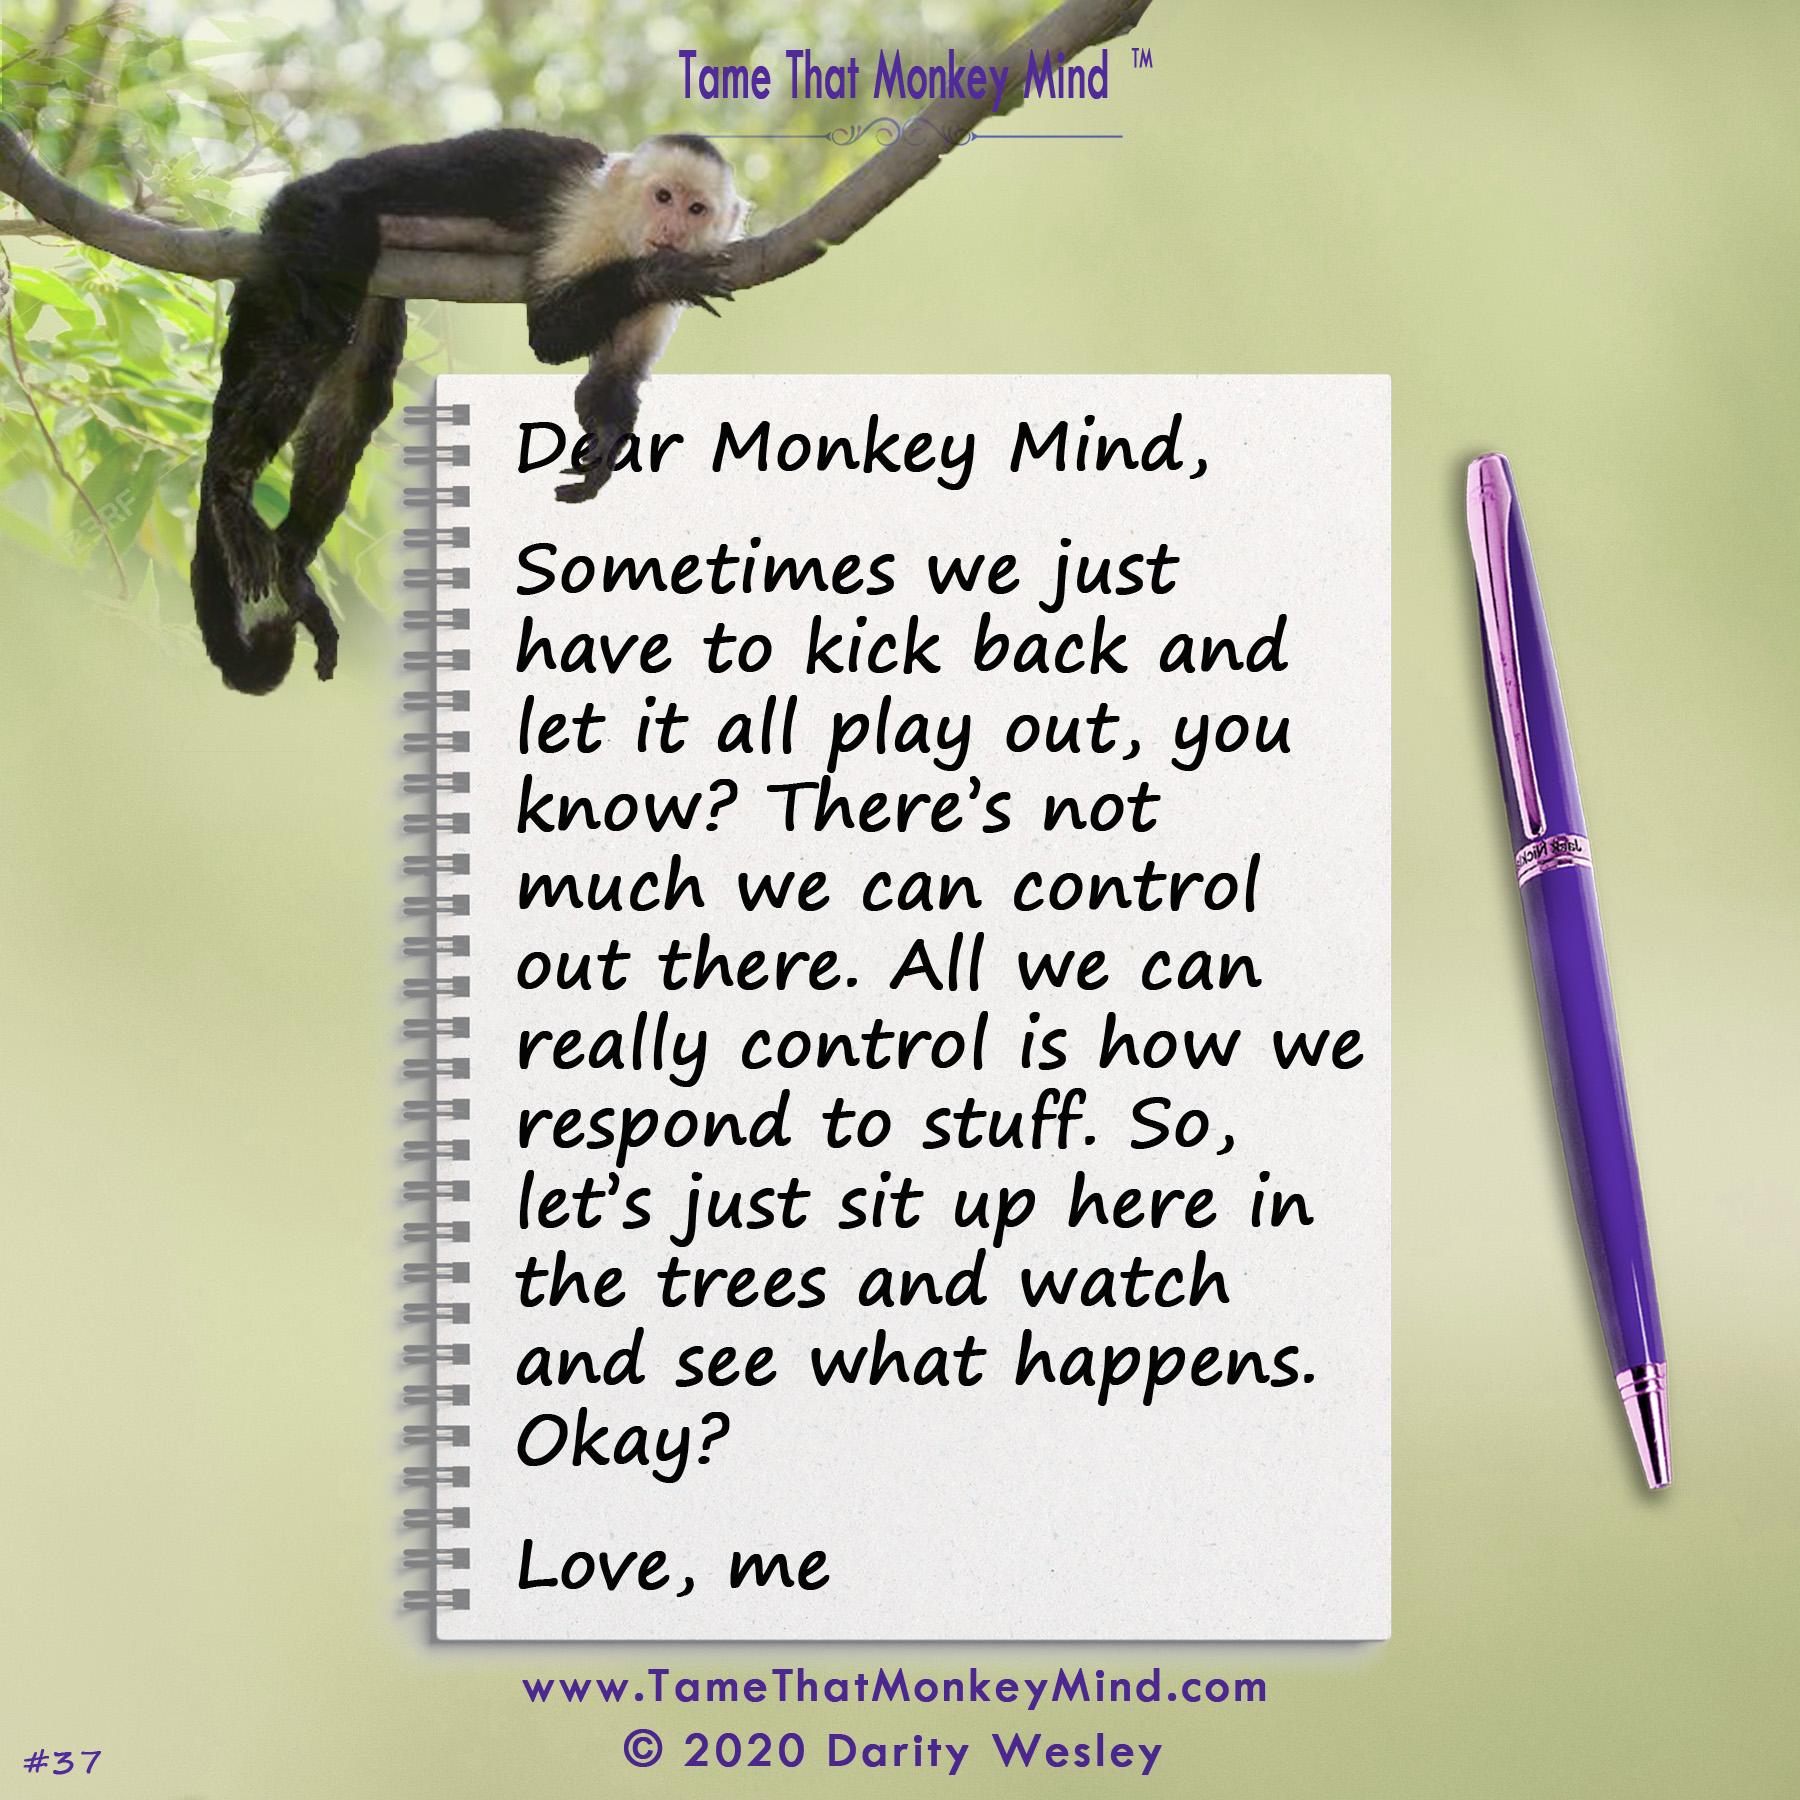 Dear Monkey Mind #37